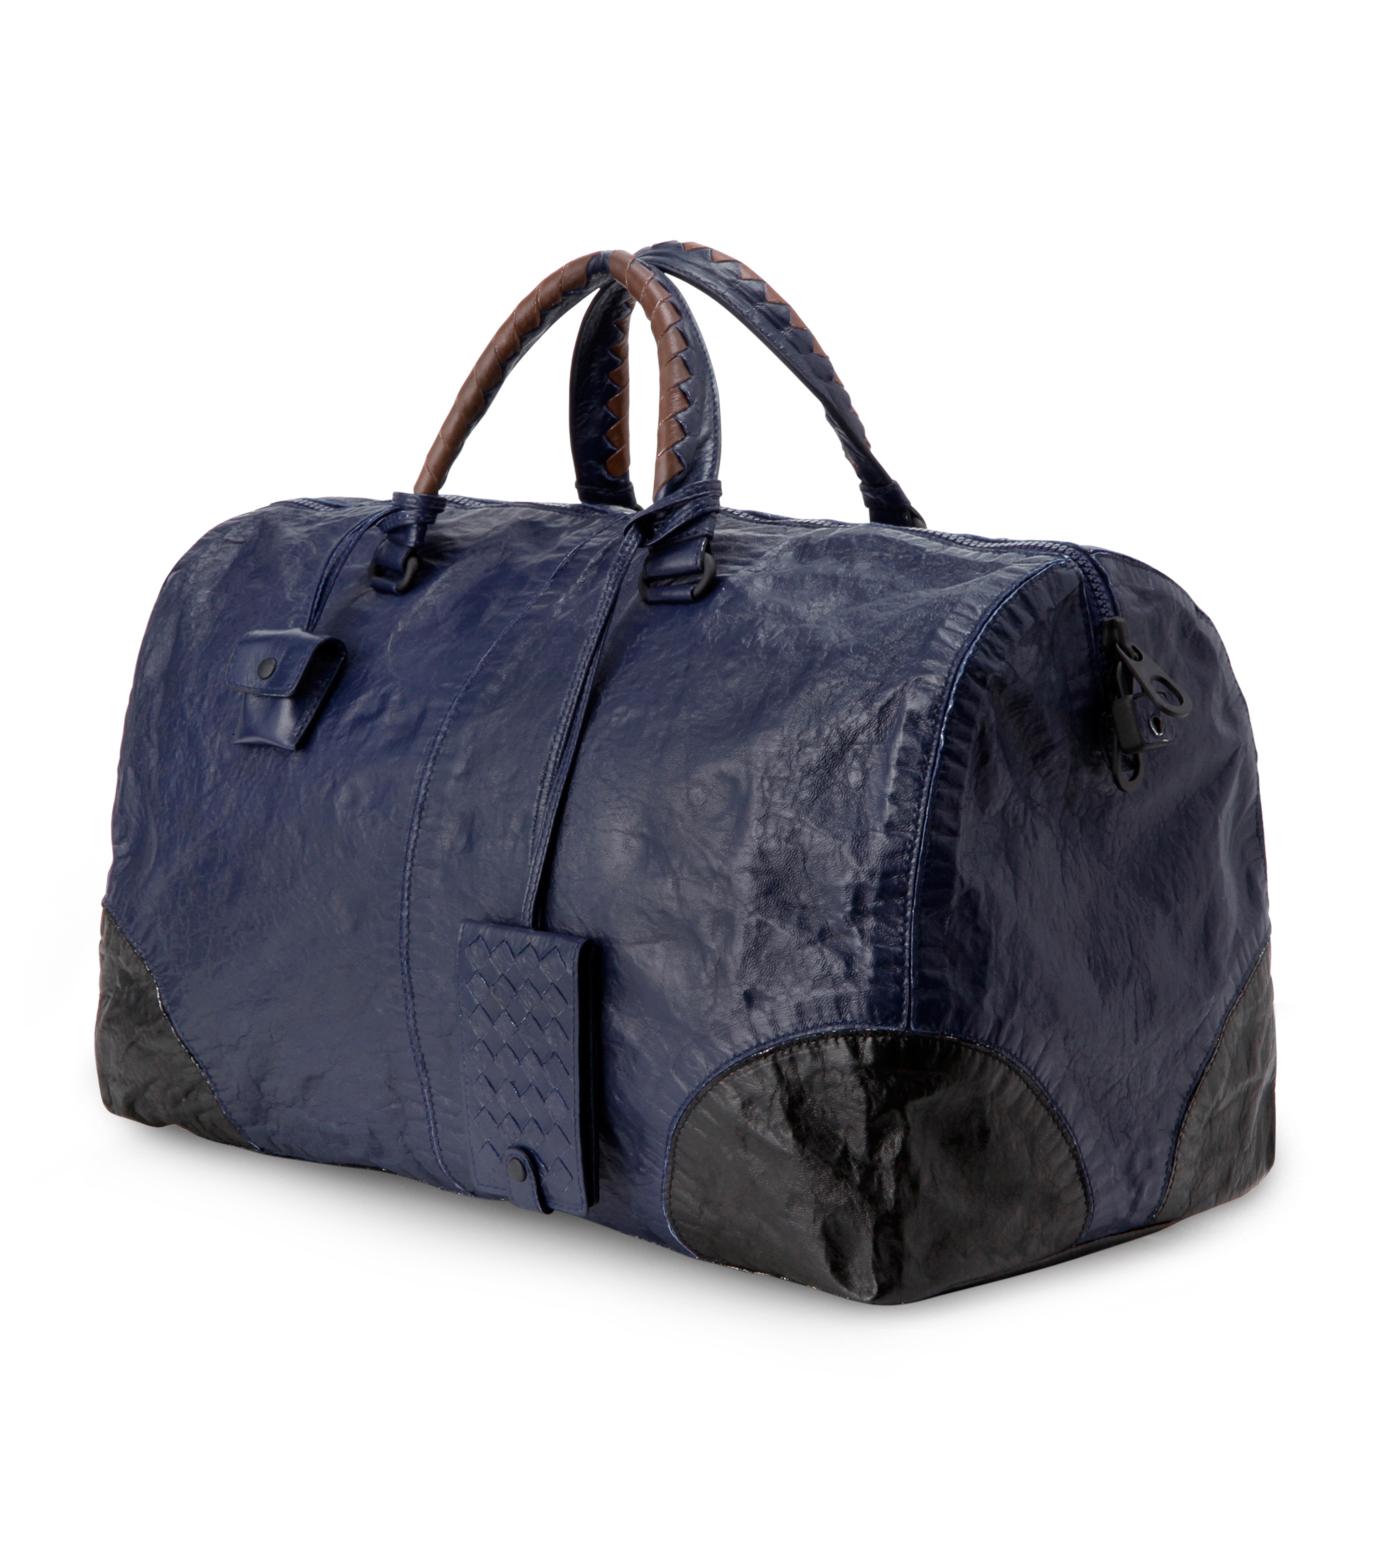 Bottega Veneta(ボッテガ ヴェネタ)のBoston bag-BLUE-302638-VX730-92 拡大詳細画像2